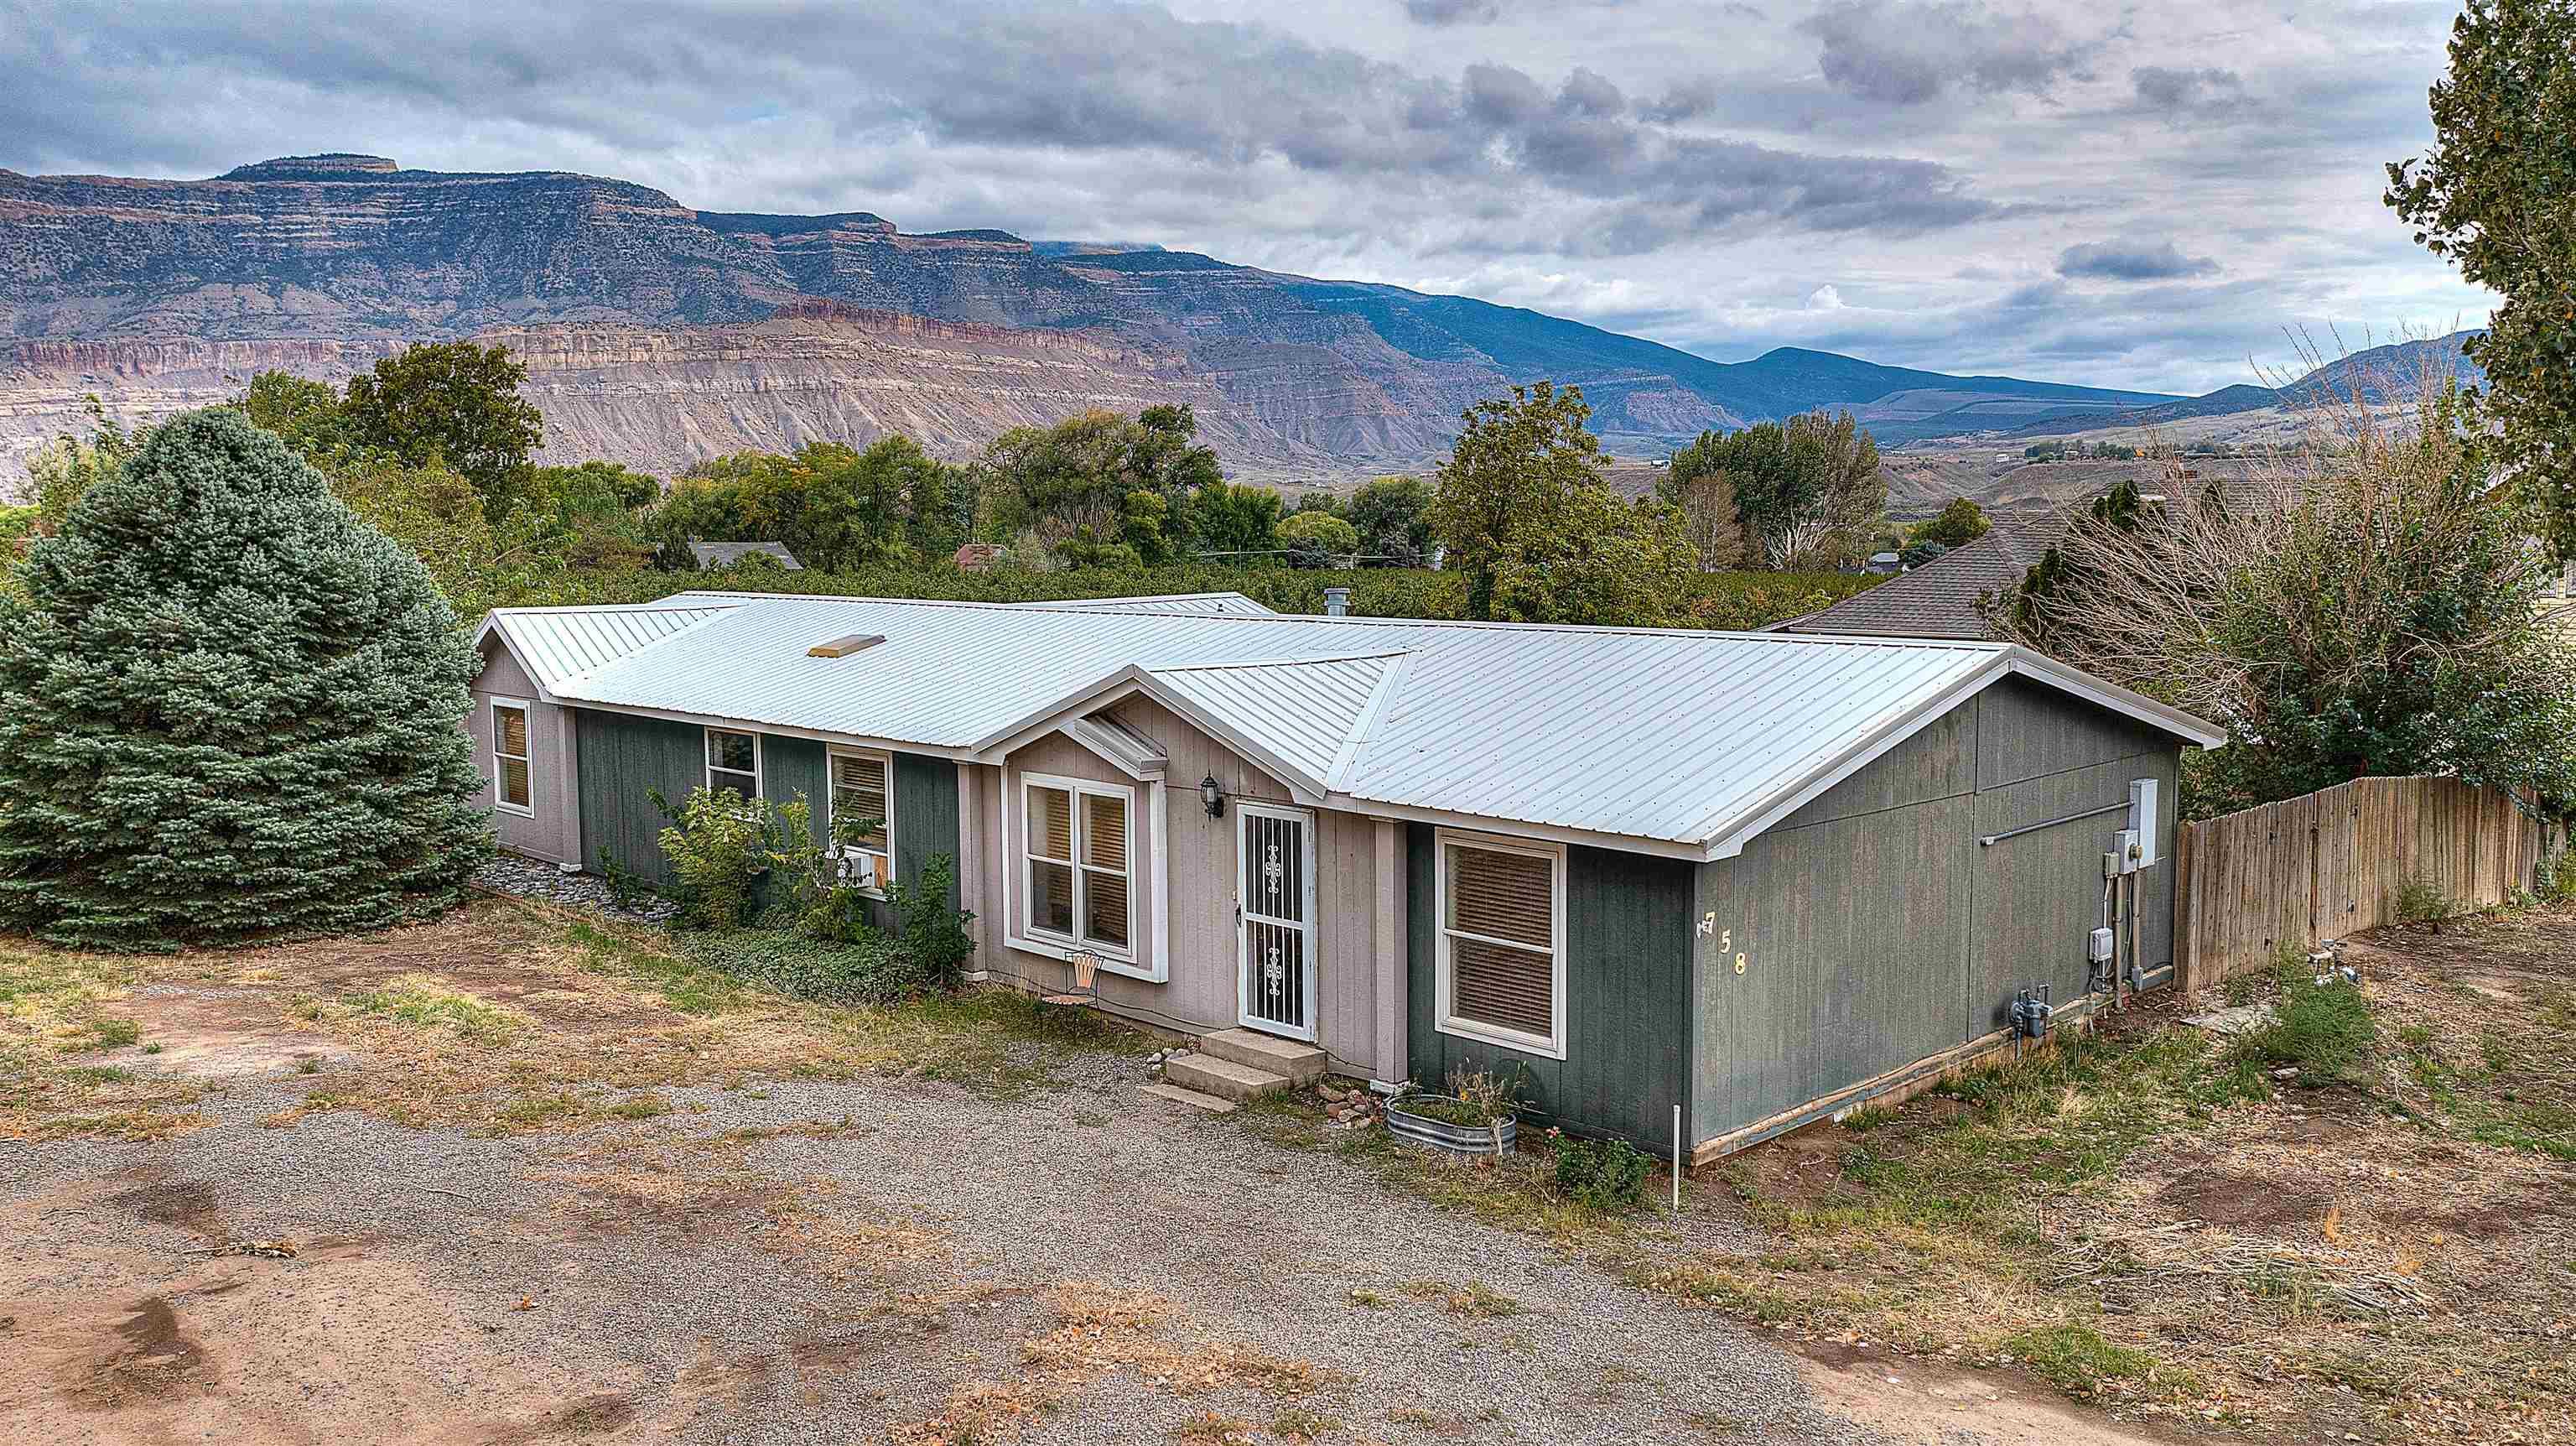 758 37 8/10 Road Property Photo 1